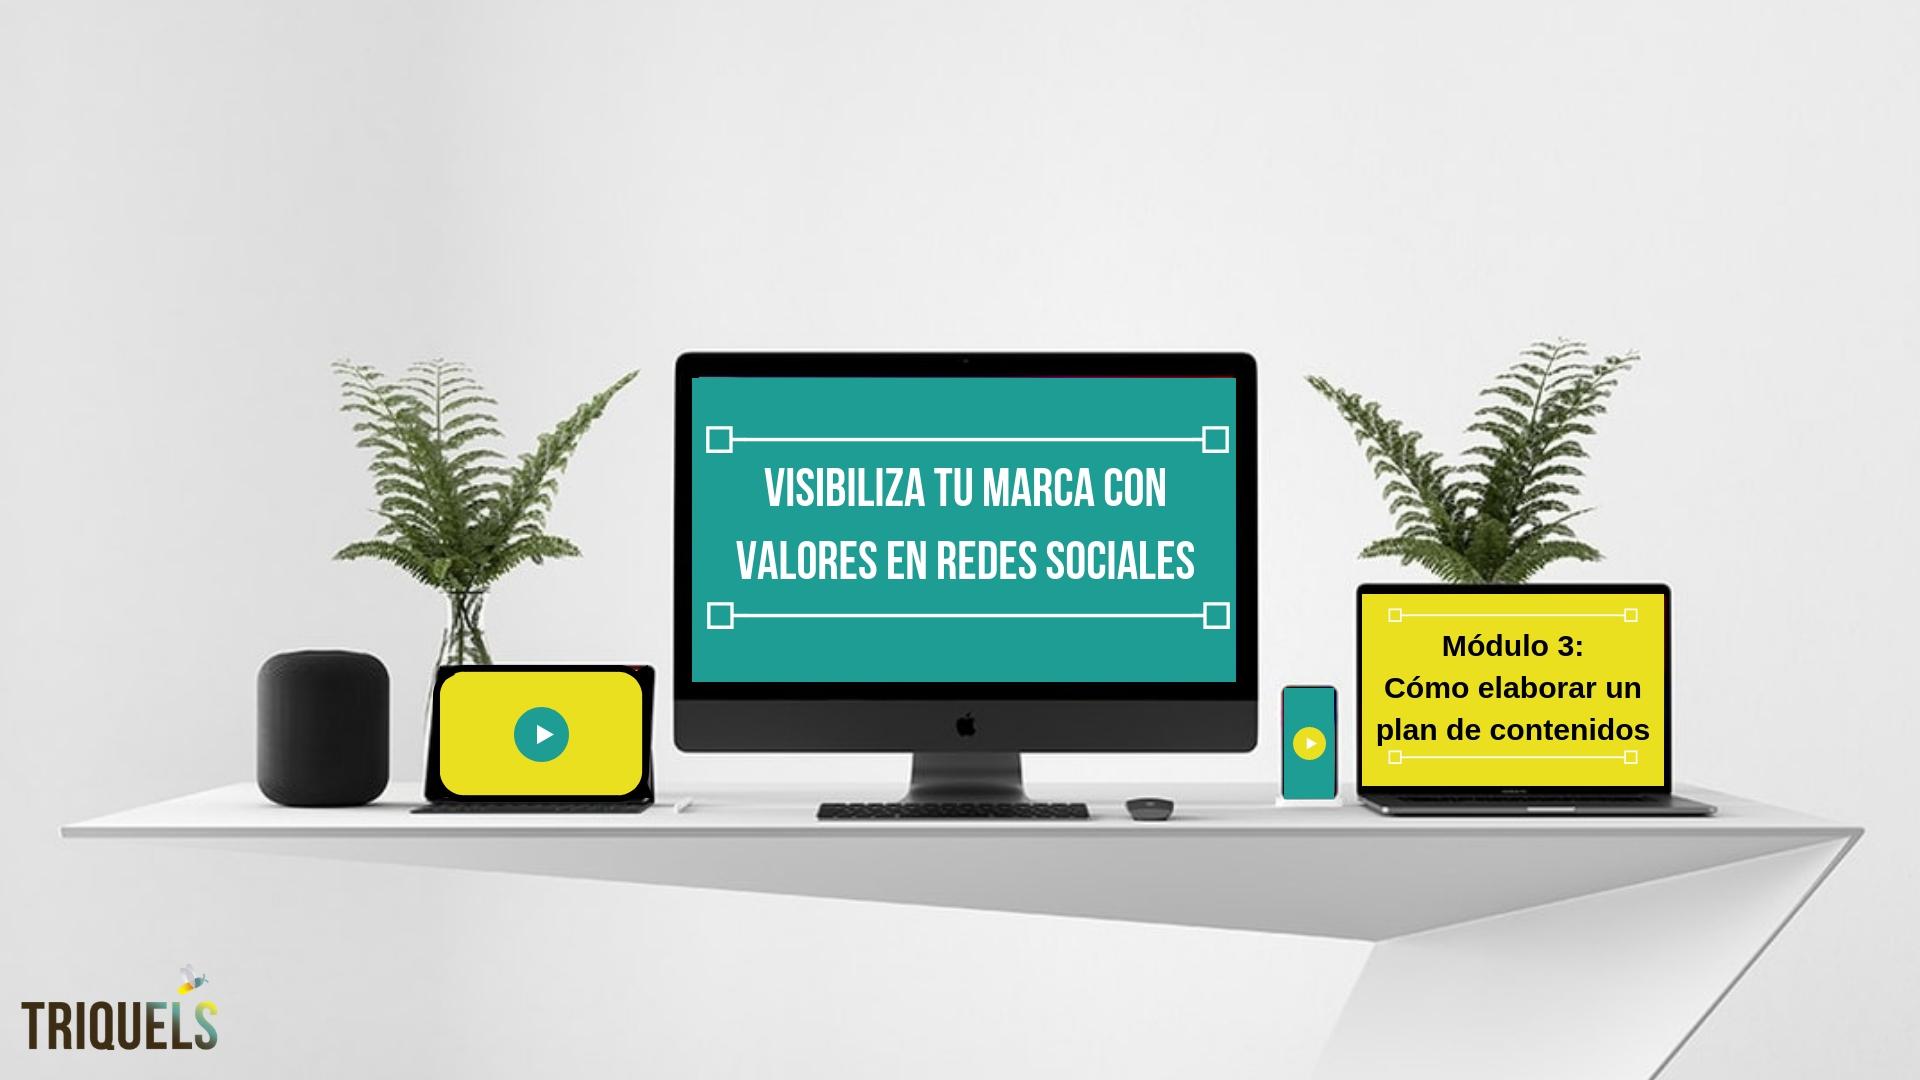 curso redes sociales para marcas con valores